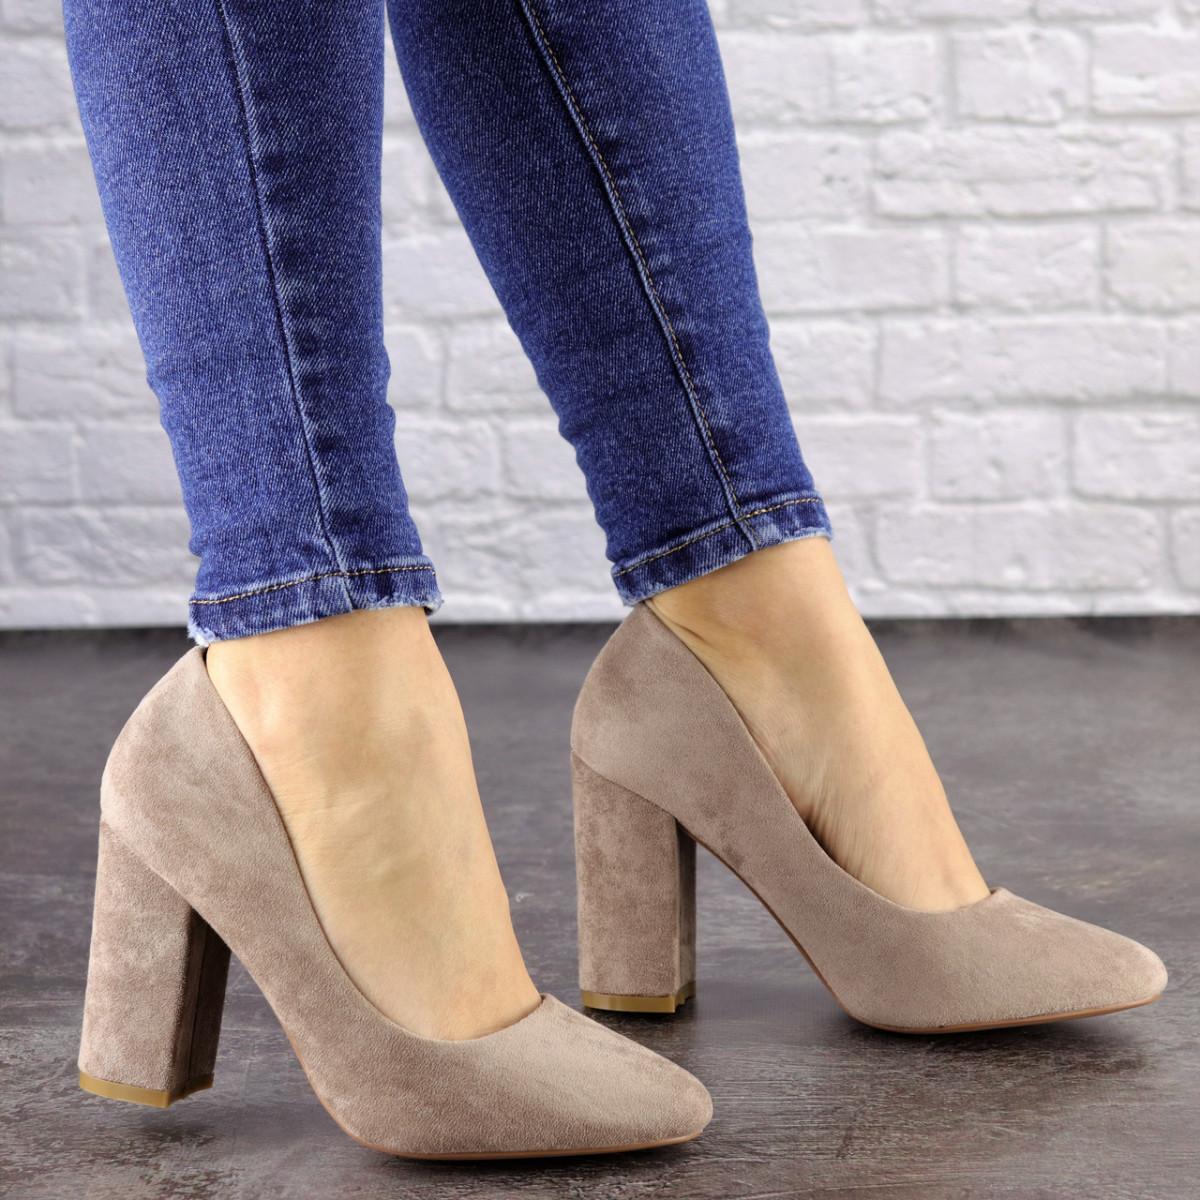 Туфли женские Nutella бежевые на каблуках 1471 (37 размер)